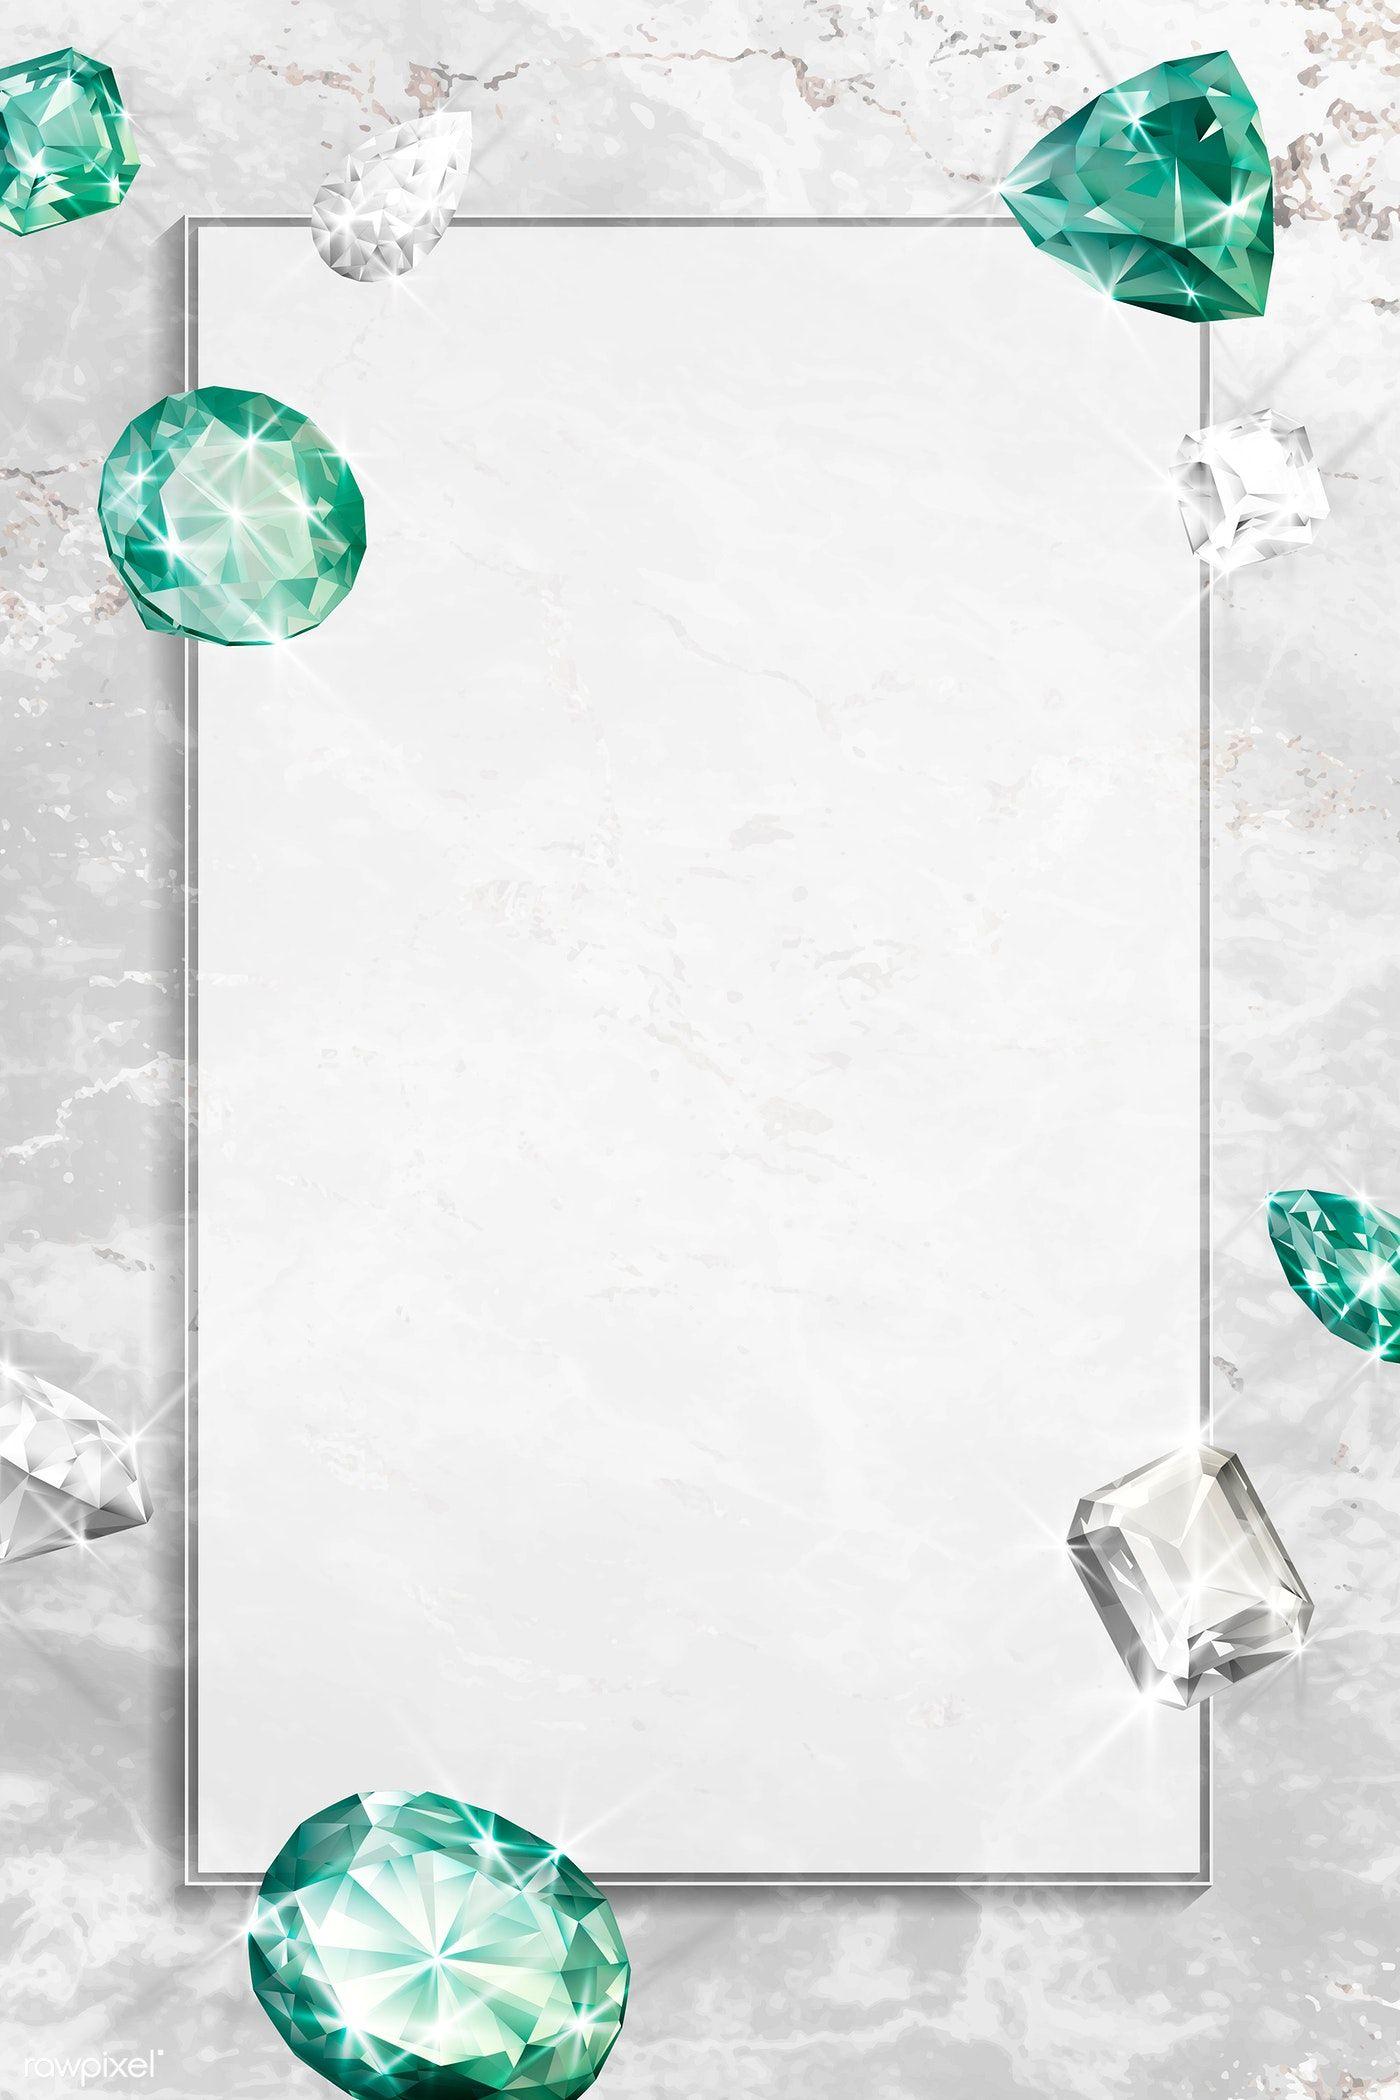 Download premium vector of Green crystal gem design vector